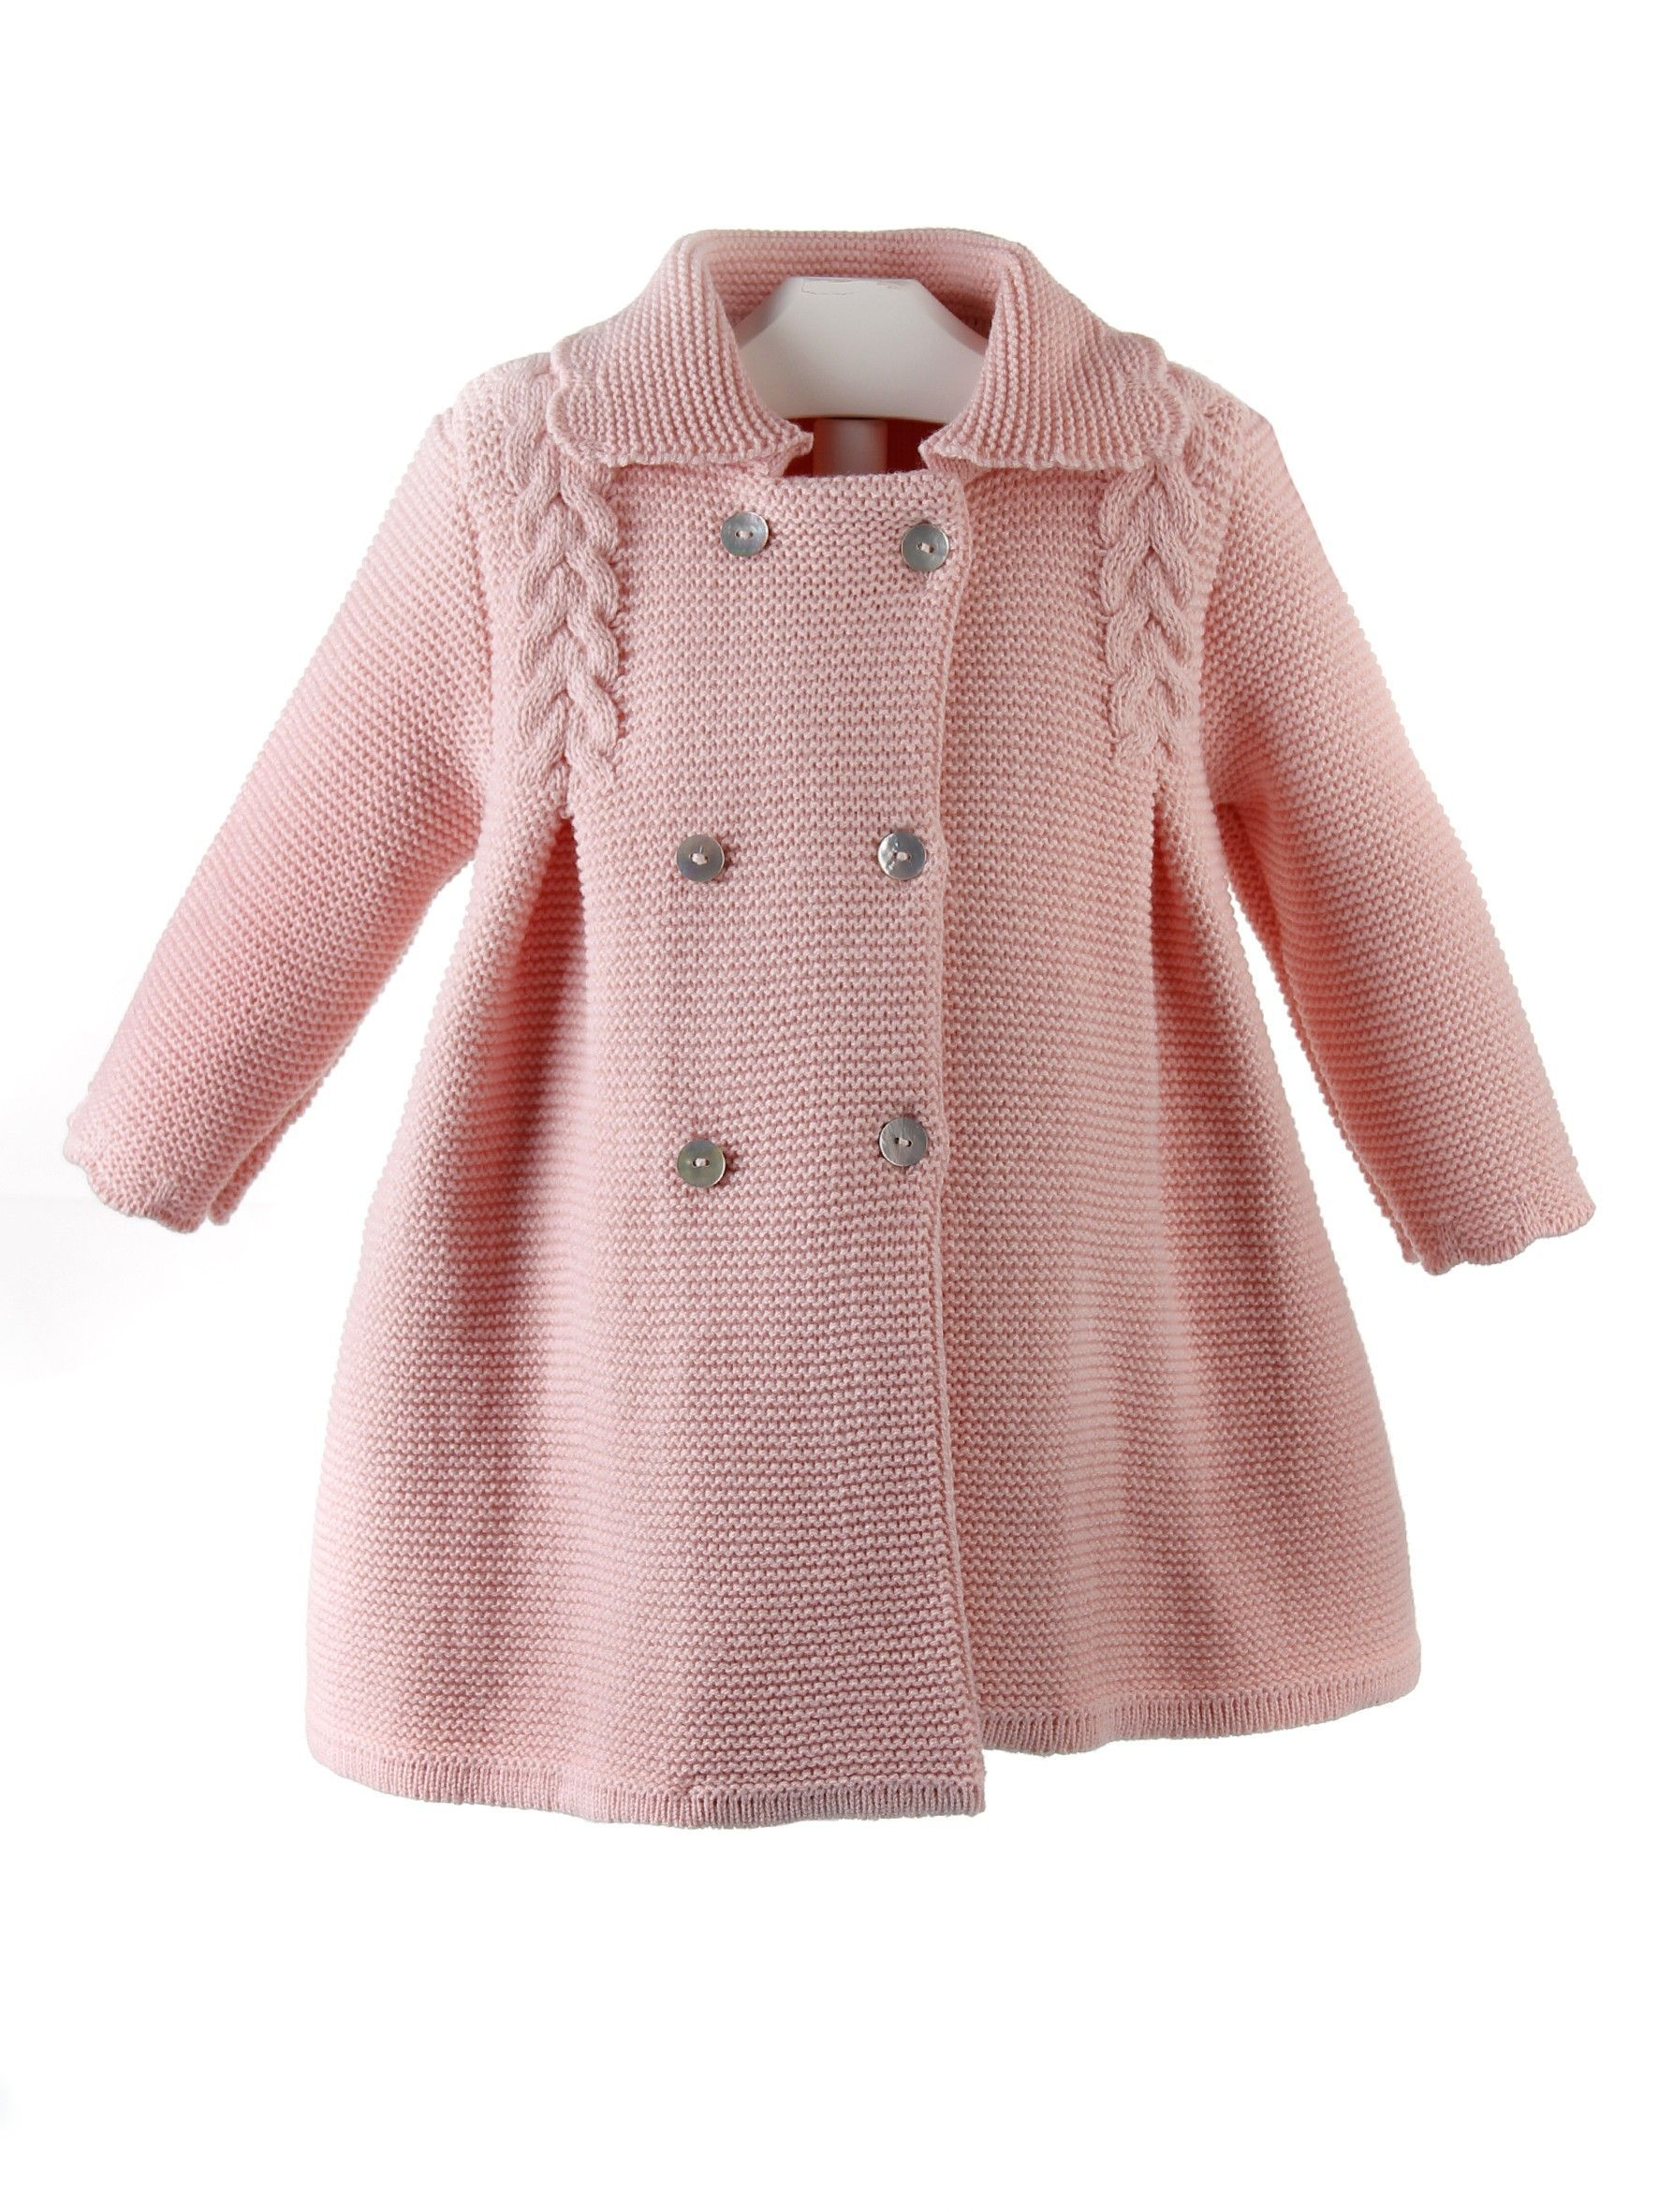 Resultado de imagen para abrigo punto bebé | Crocheted top ...